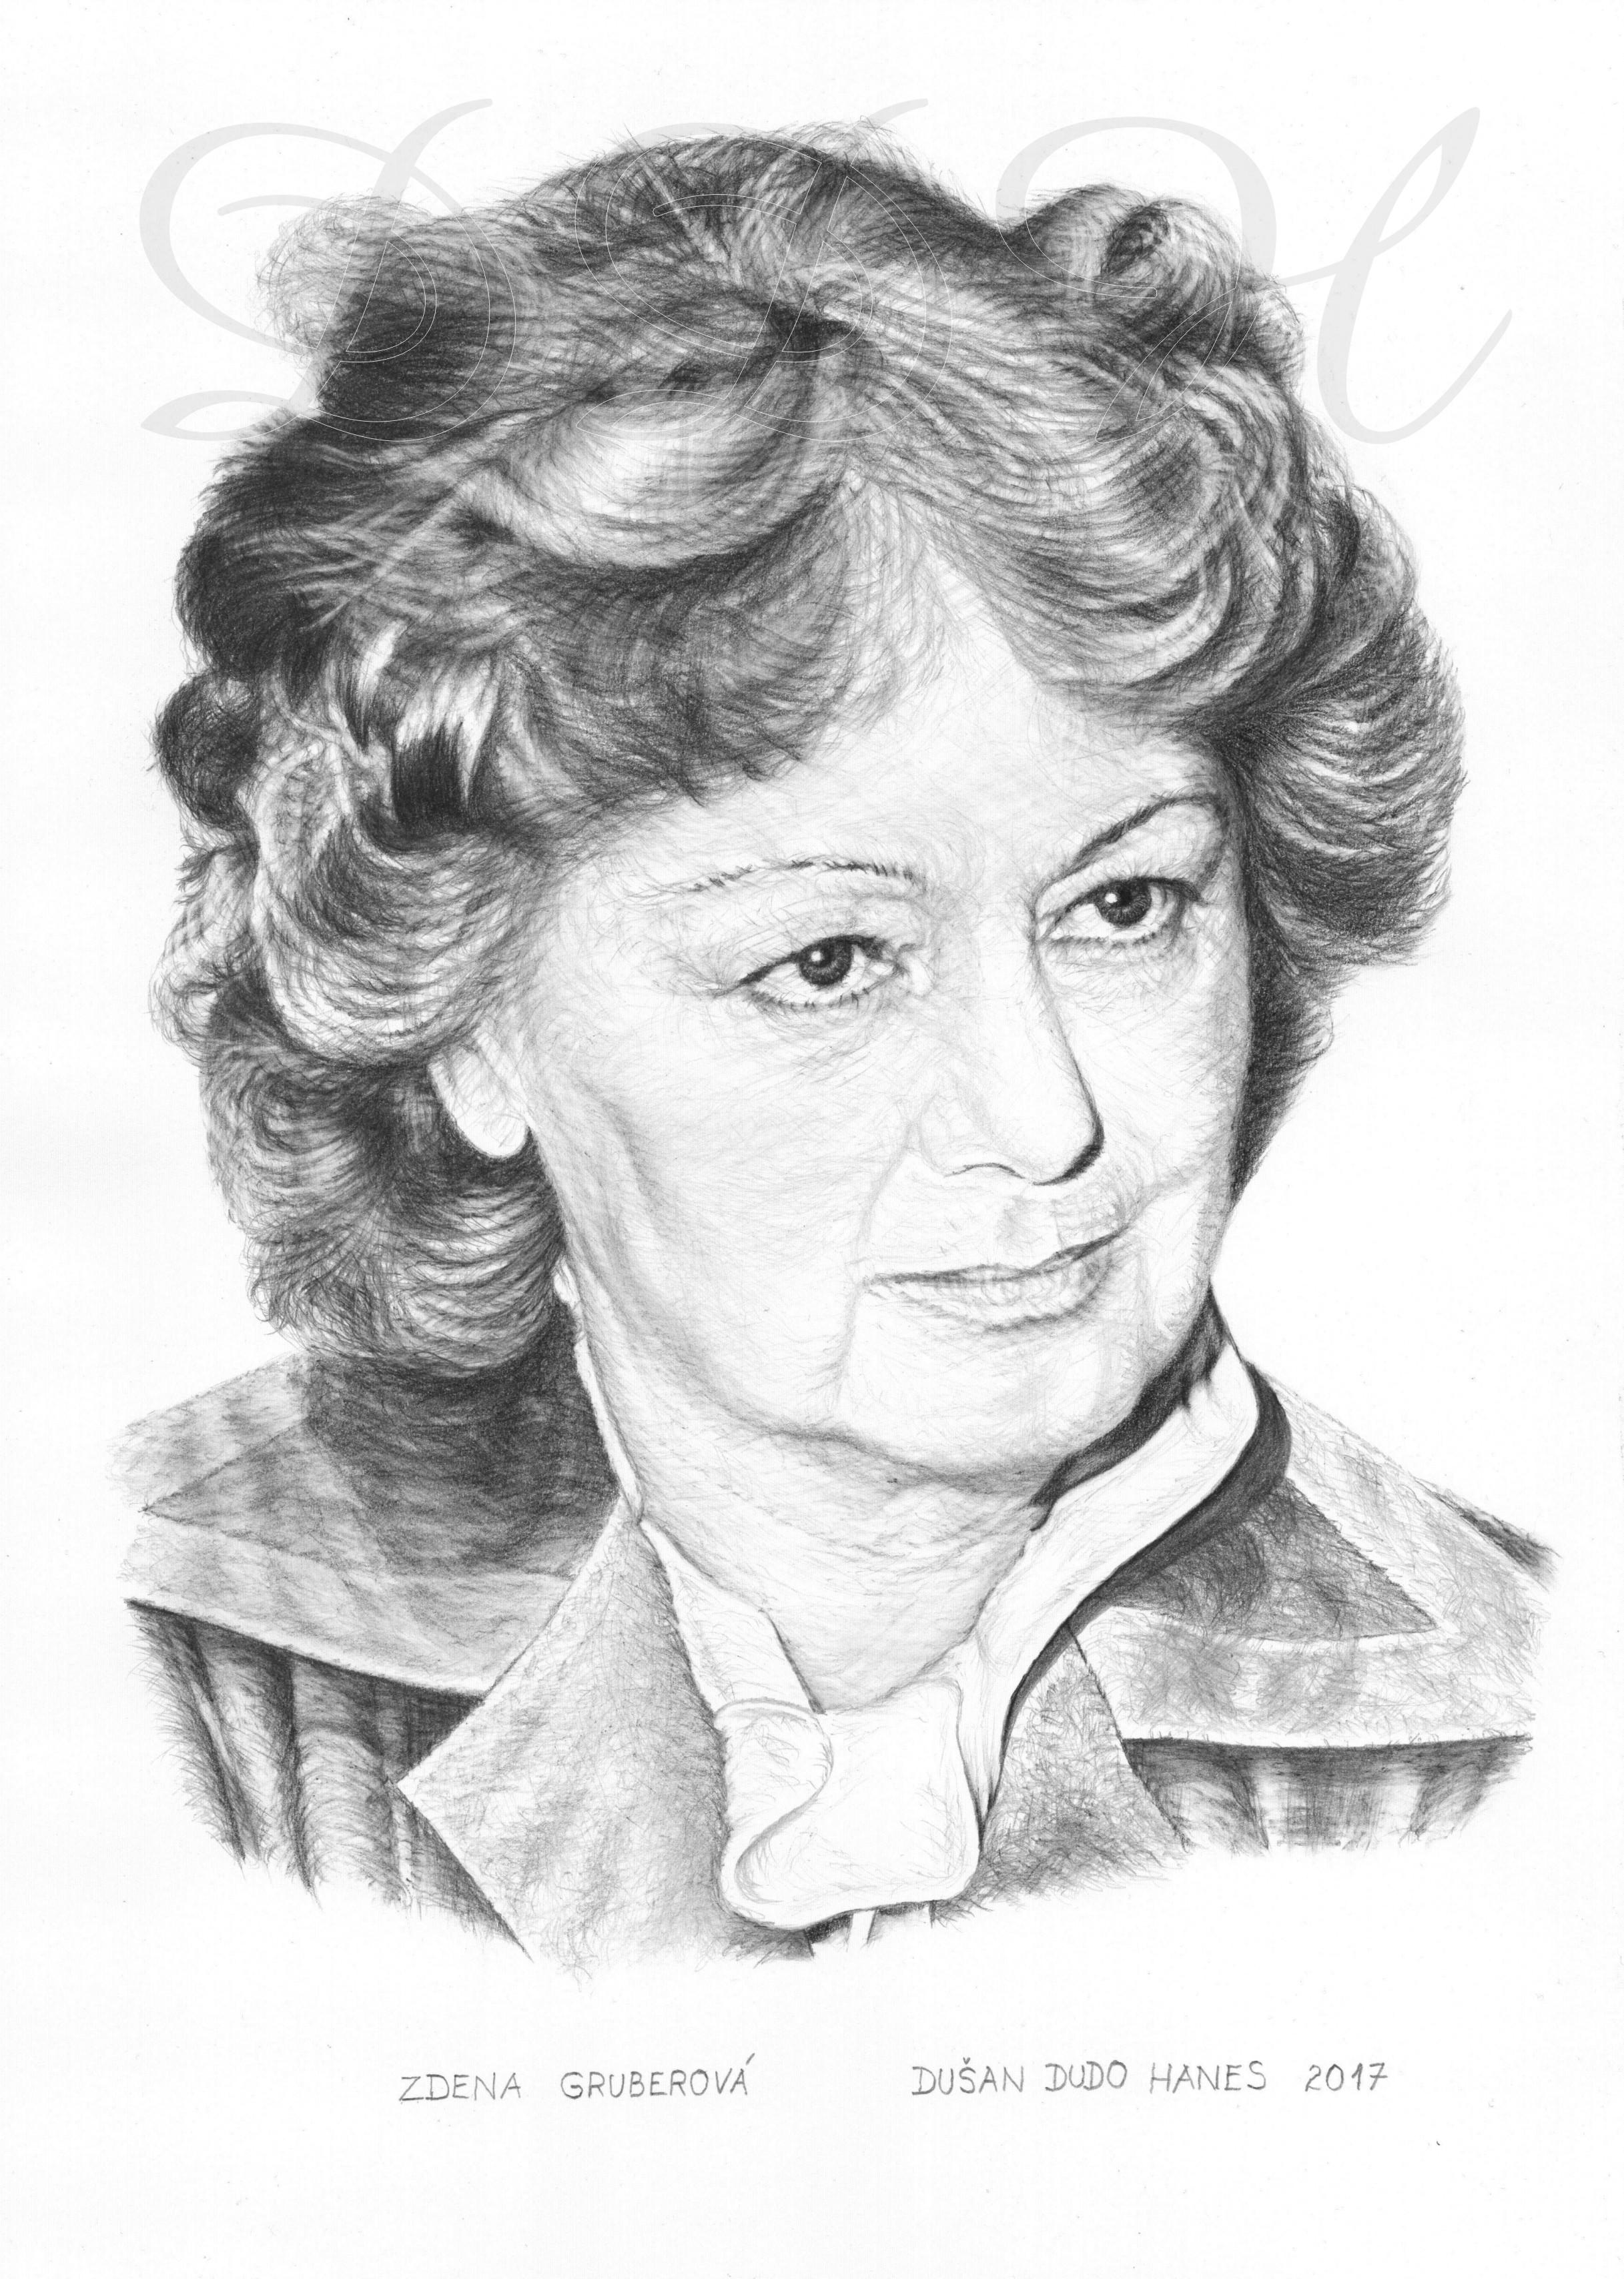 107 - Zdena Gruberová, portrét Dušan Dudo Hanes